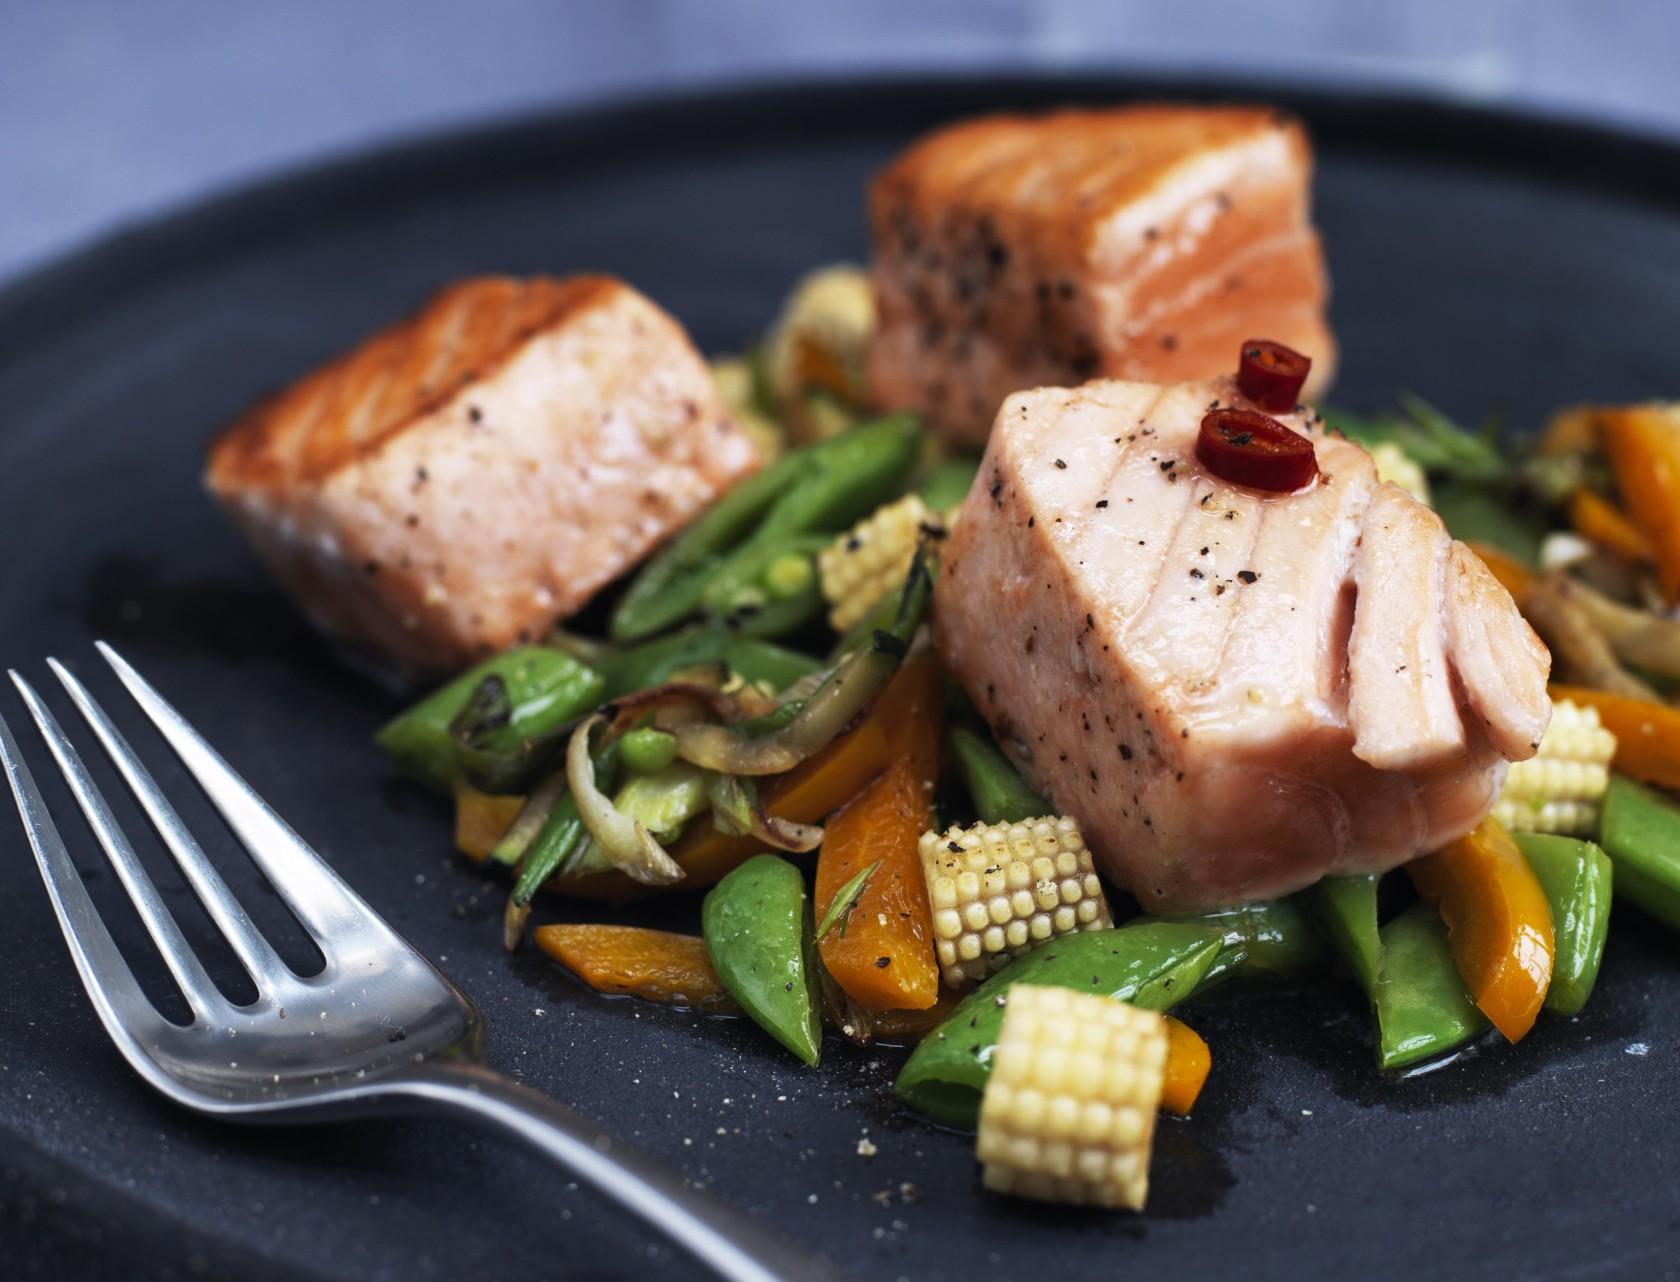 Lynstegte grøntsager med laks og spicy dressing - nem og lækker opskrift.